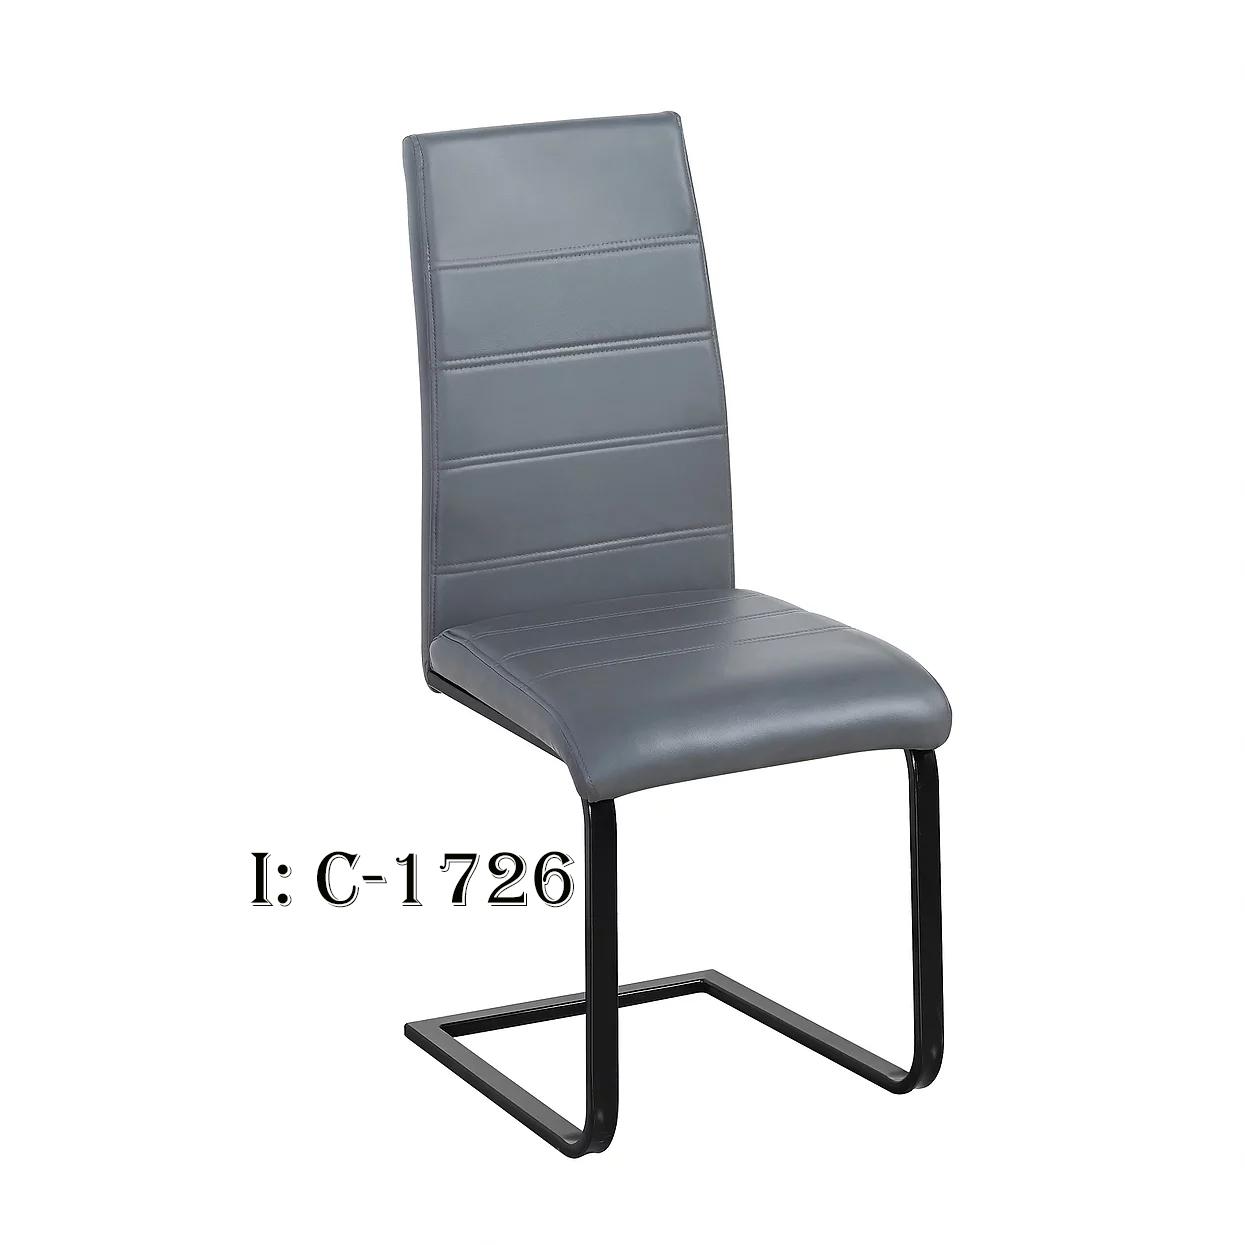 C-1726